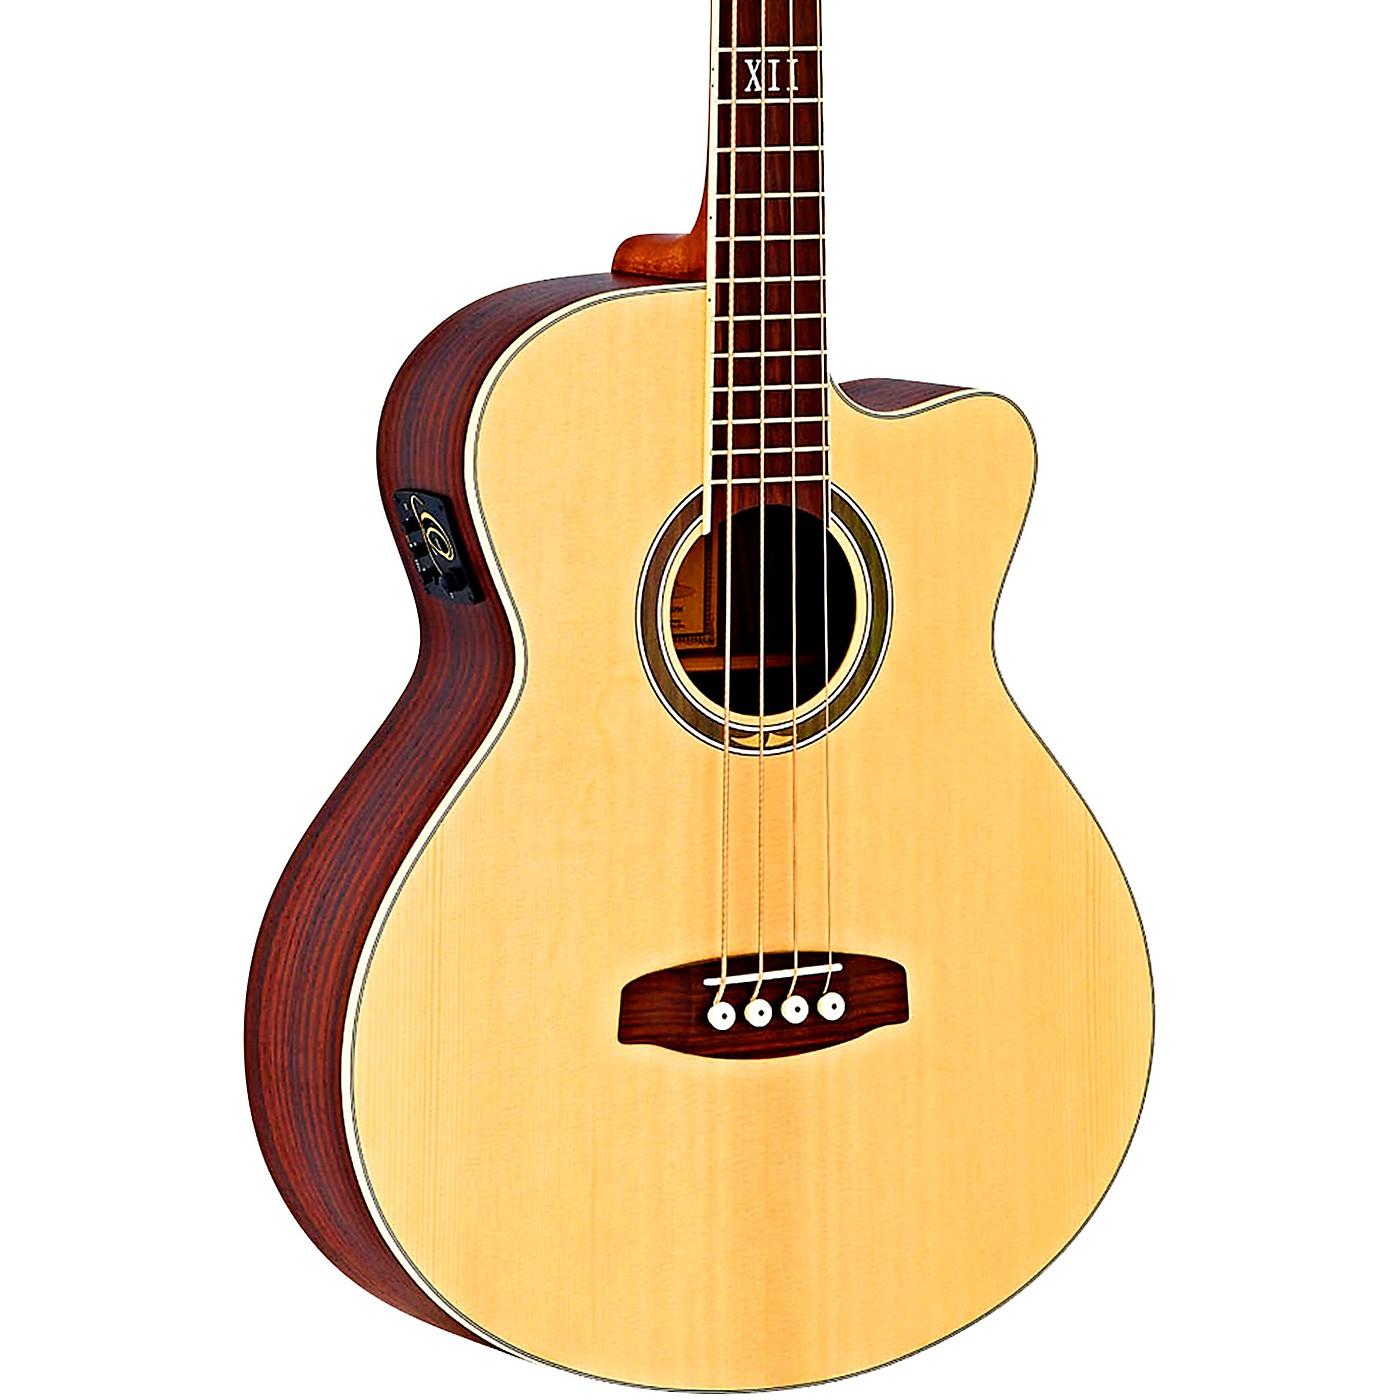 Ortega Deep Series 5 D558-4 Walnut Acoustic-Electric Bass thumbnail